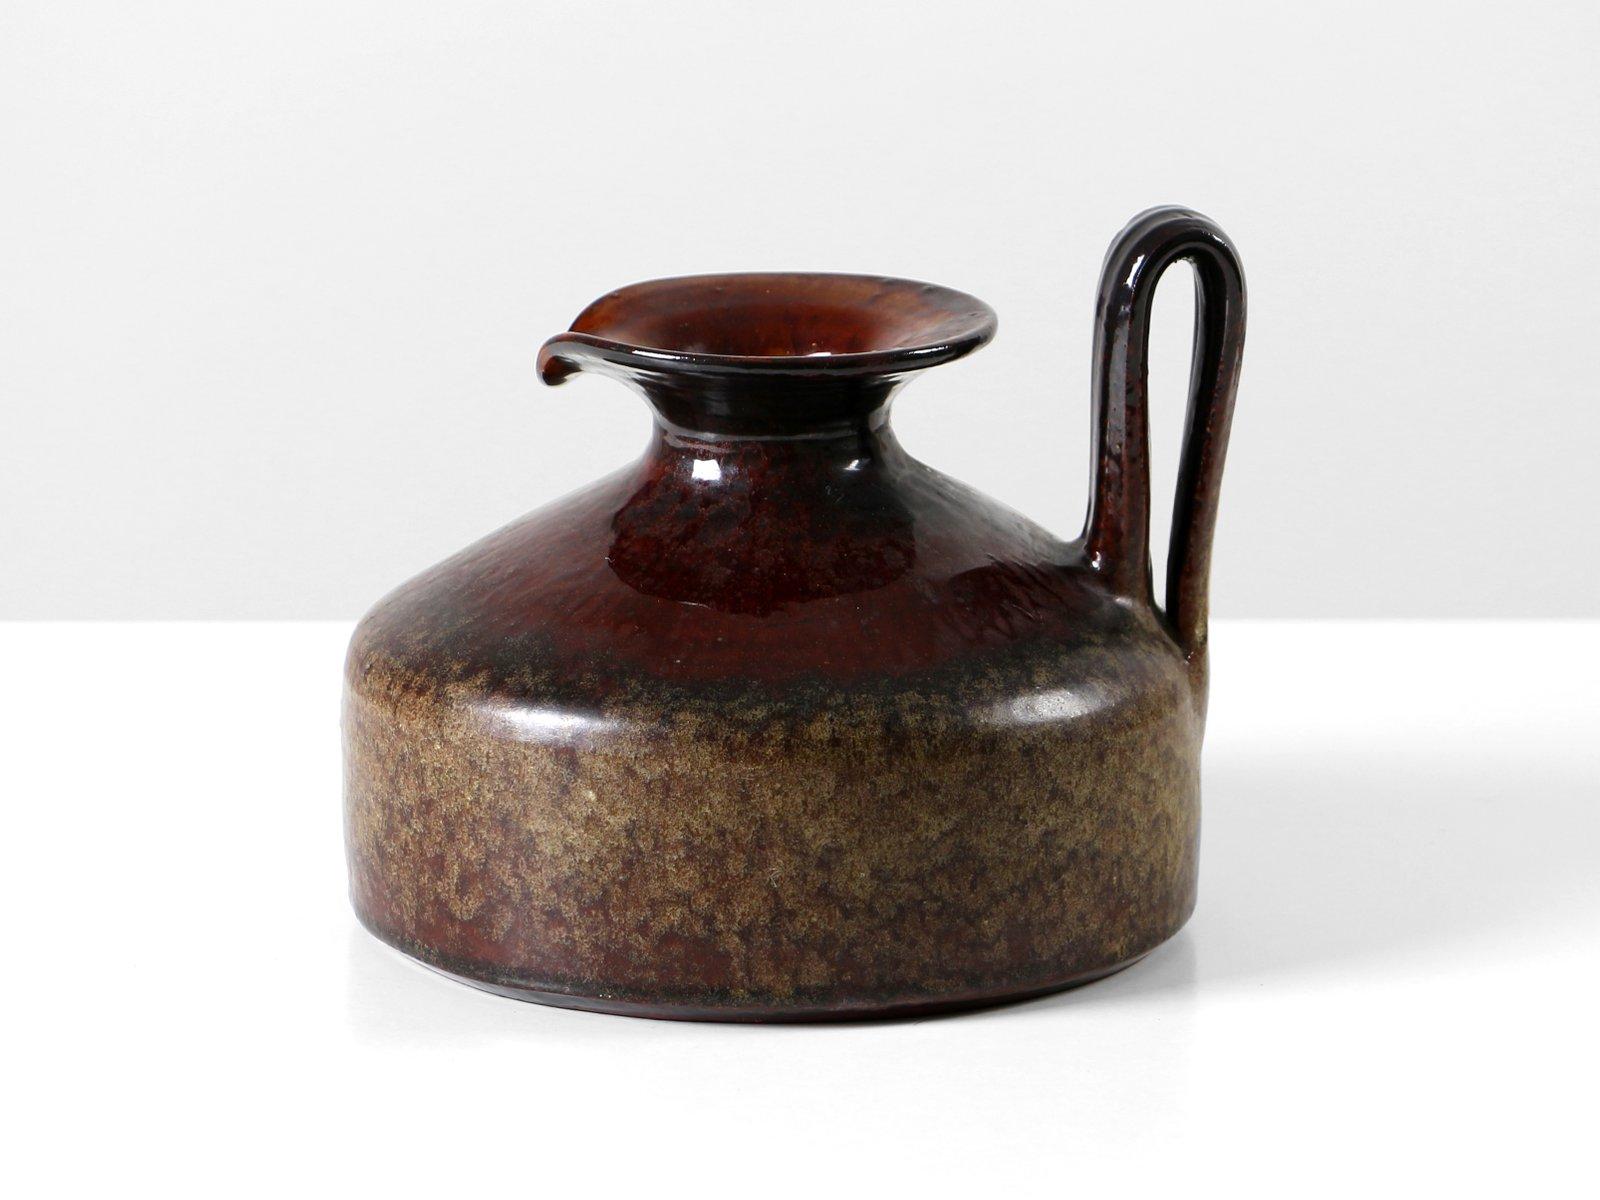 keramik vase Studio Keramik Vase by Elke & Elmar Kubicek, 1960s for sale at Pamono keramik vase